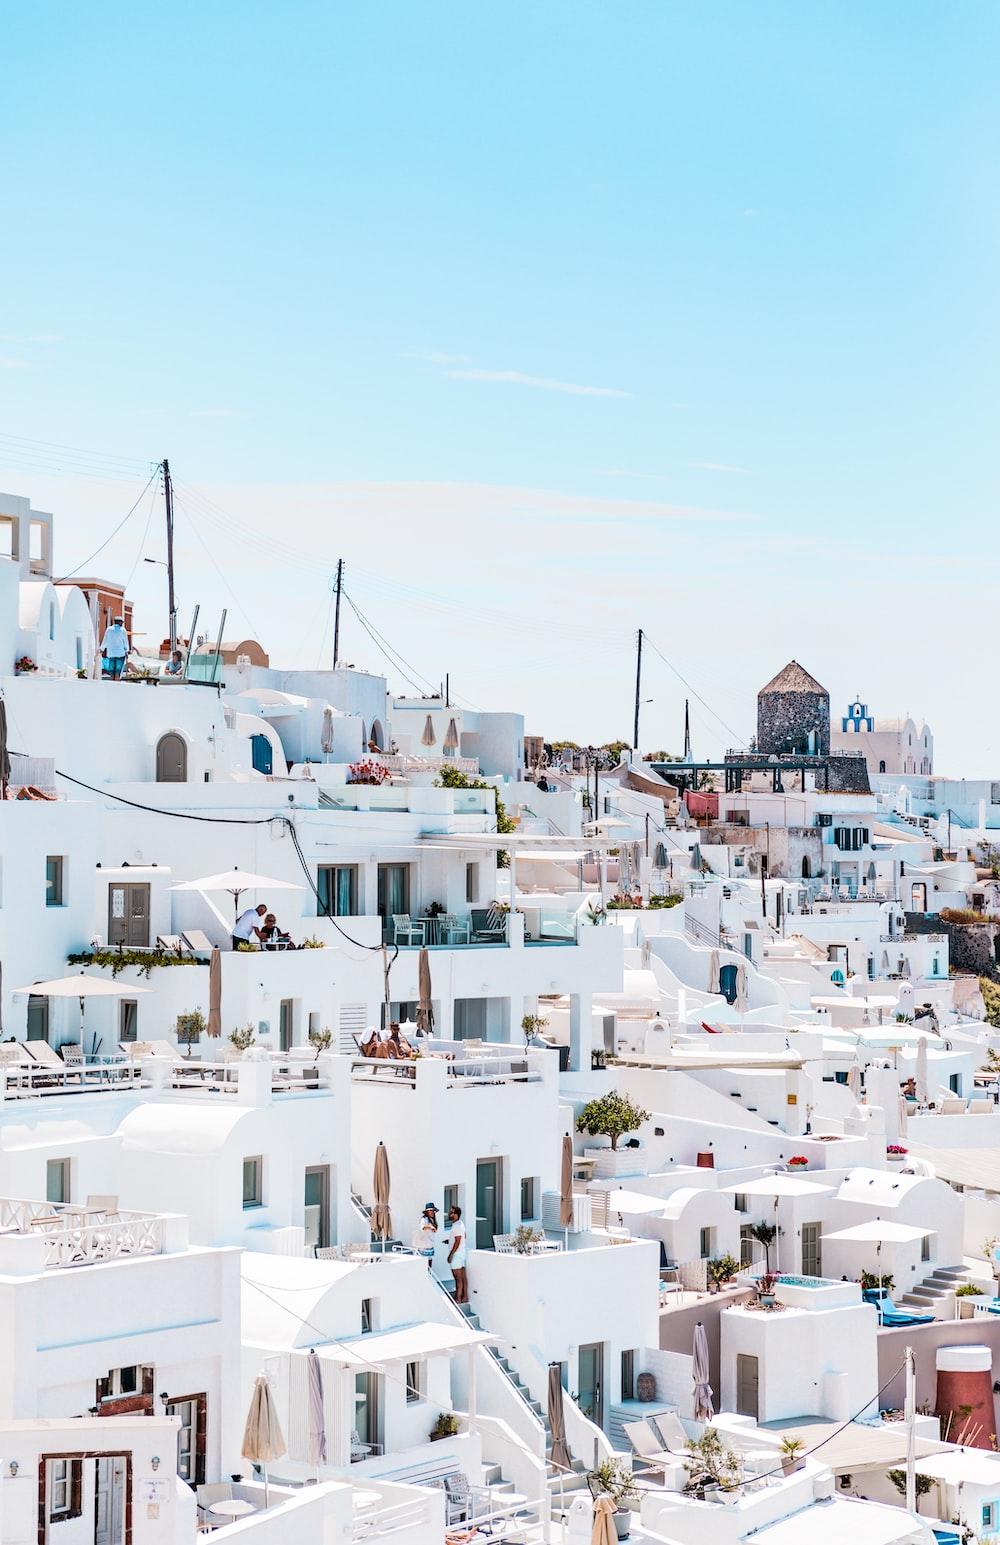 white concrete houses under blue sky at daytime